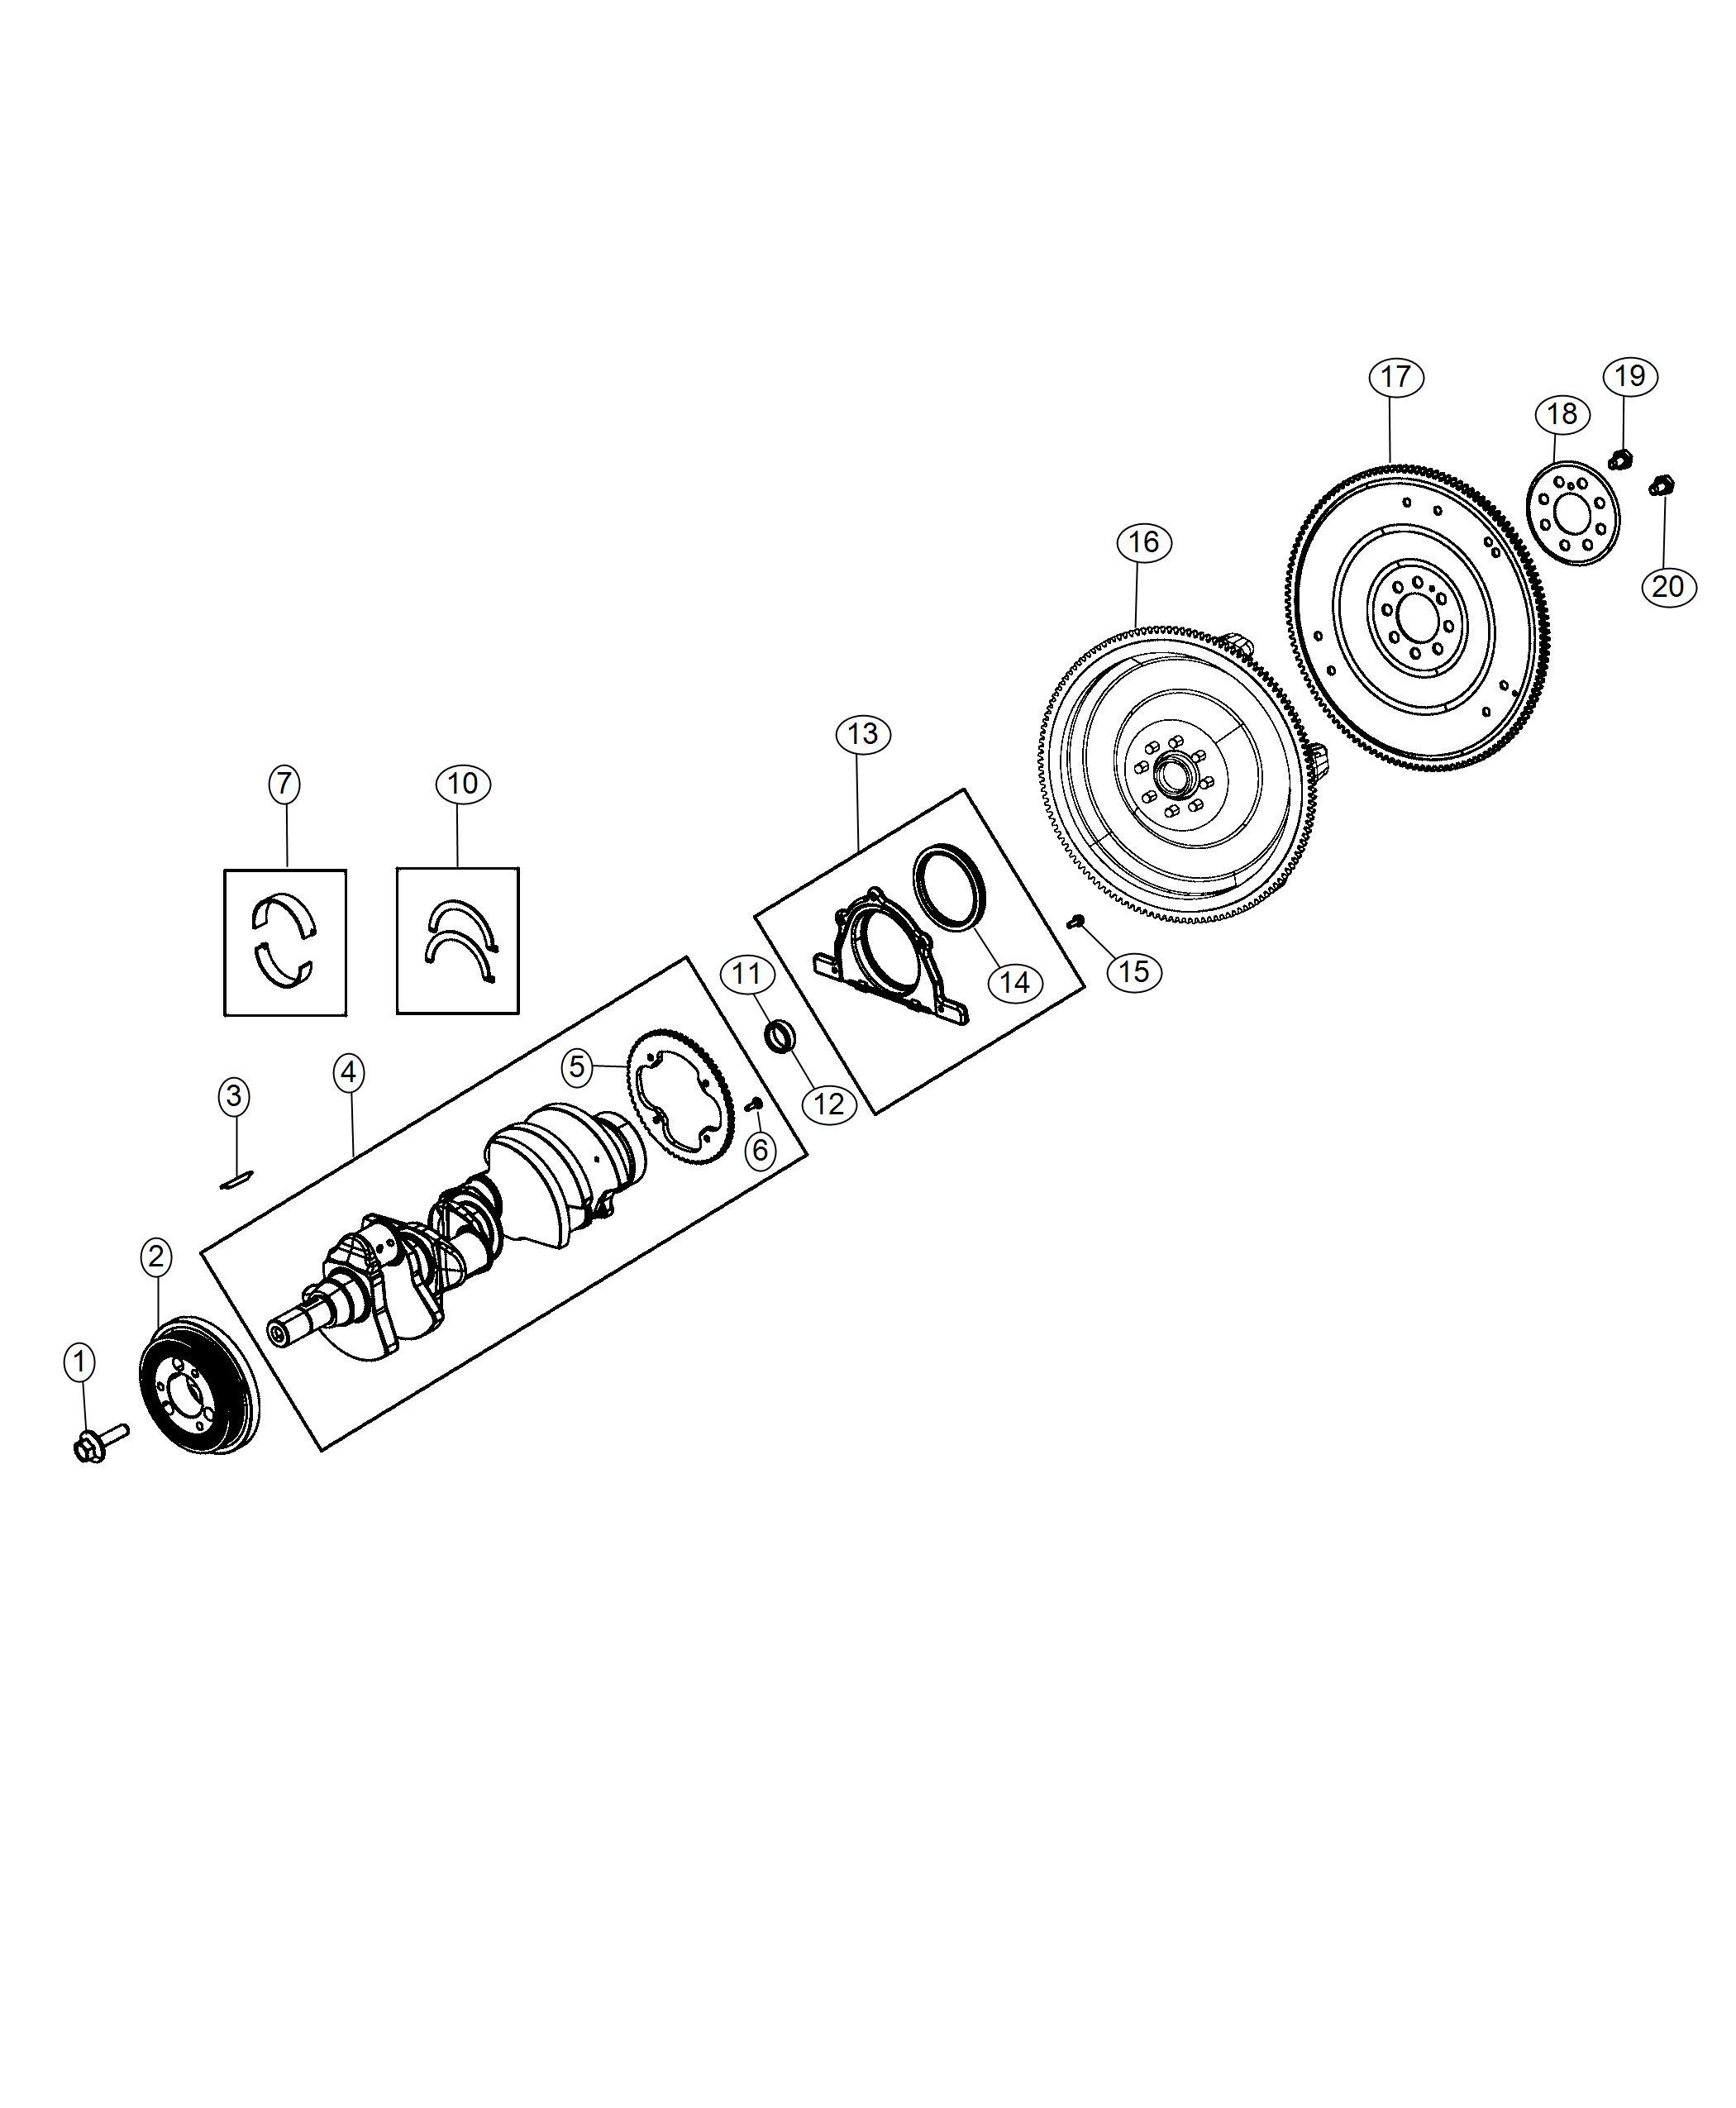 Dodge Challenger Crankshaft Engine